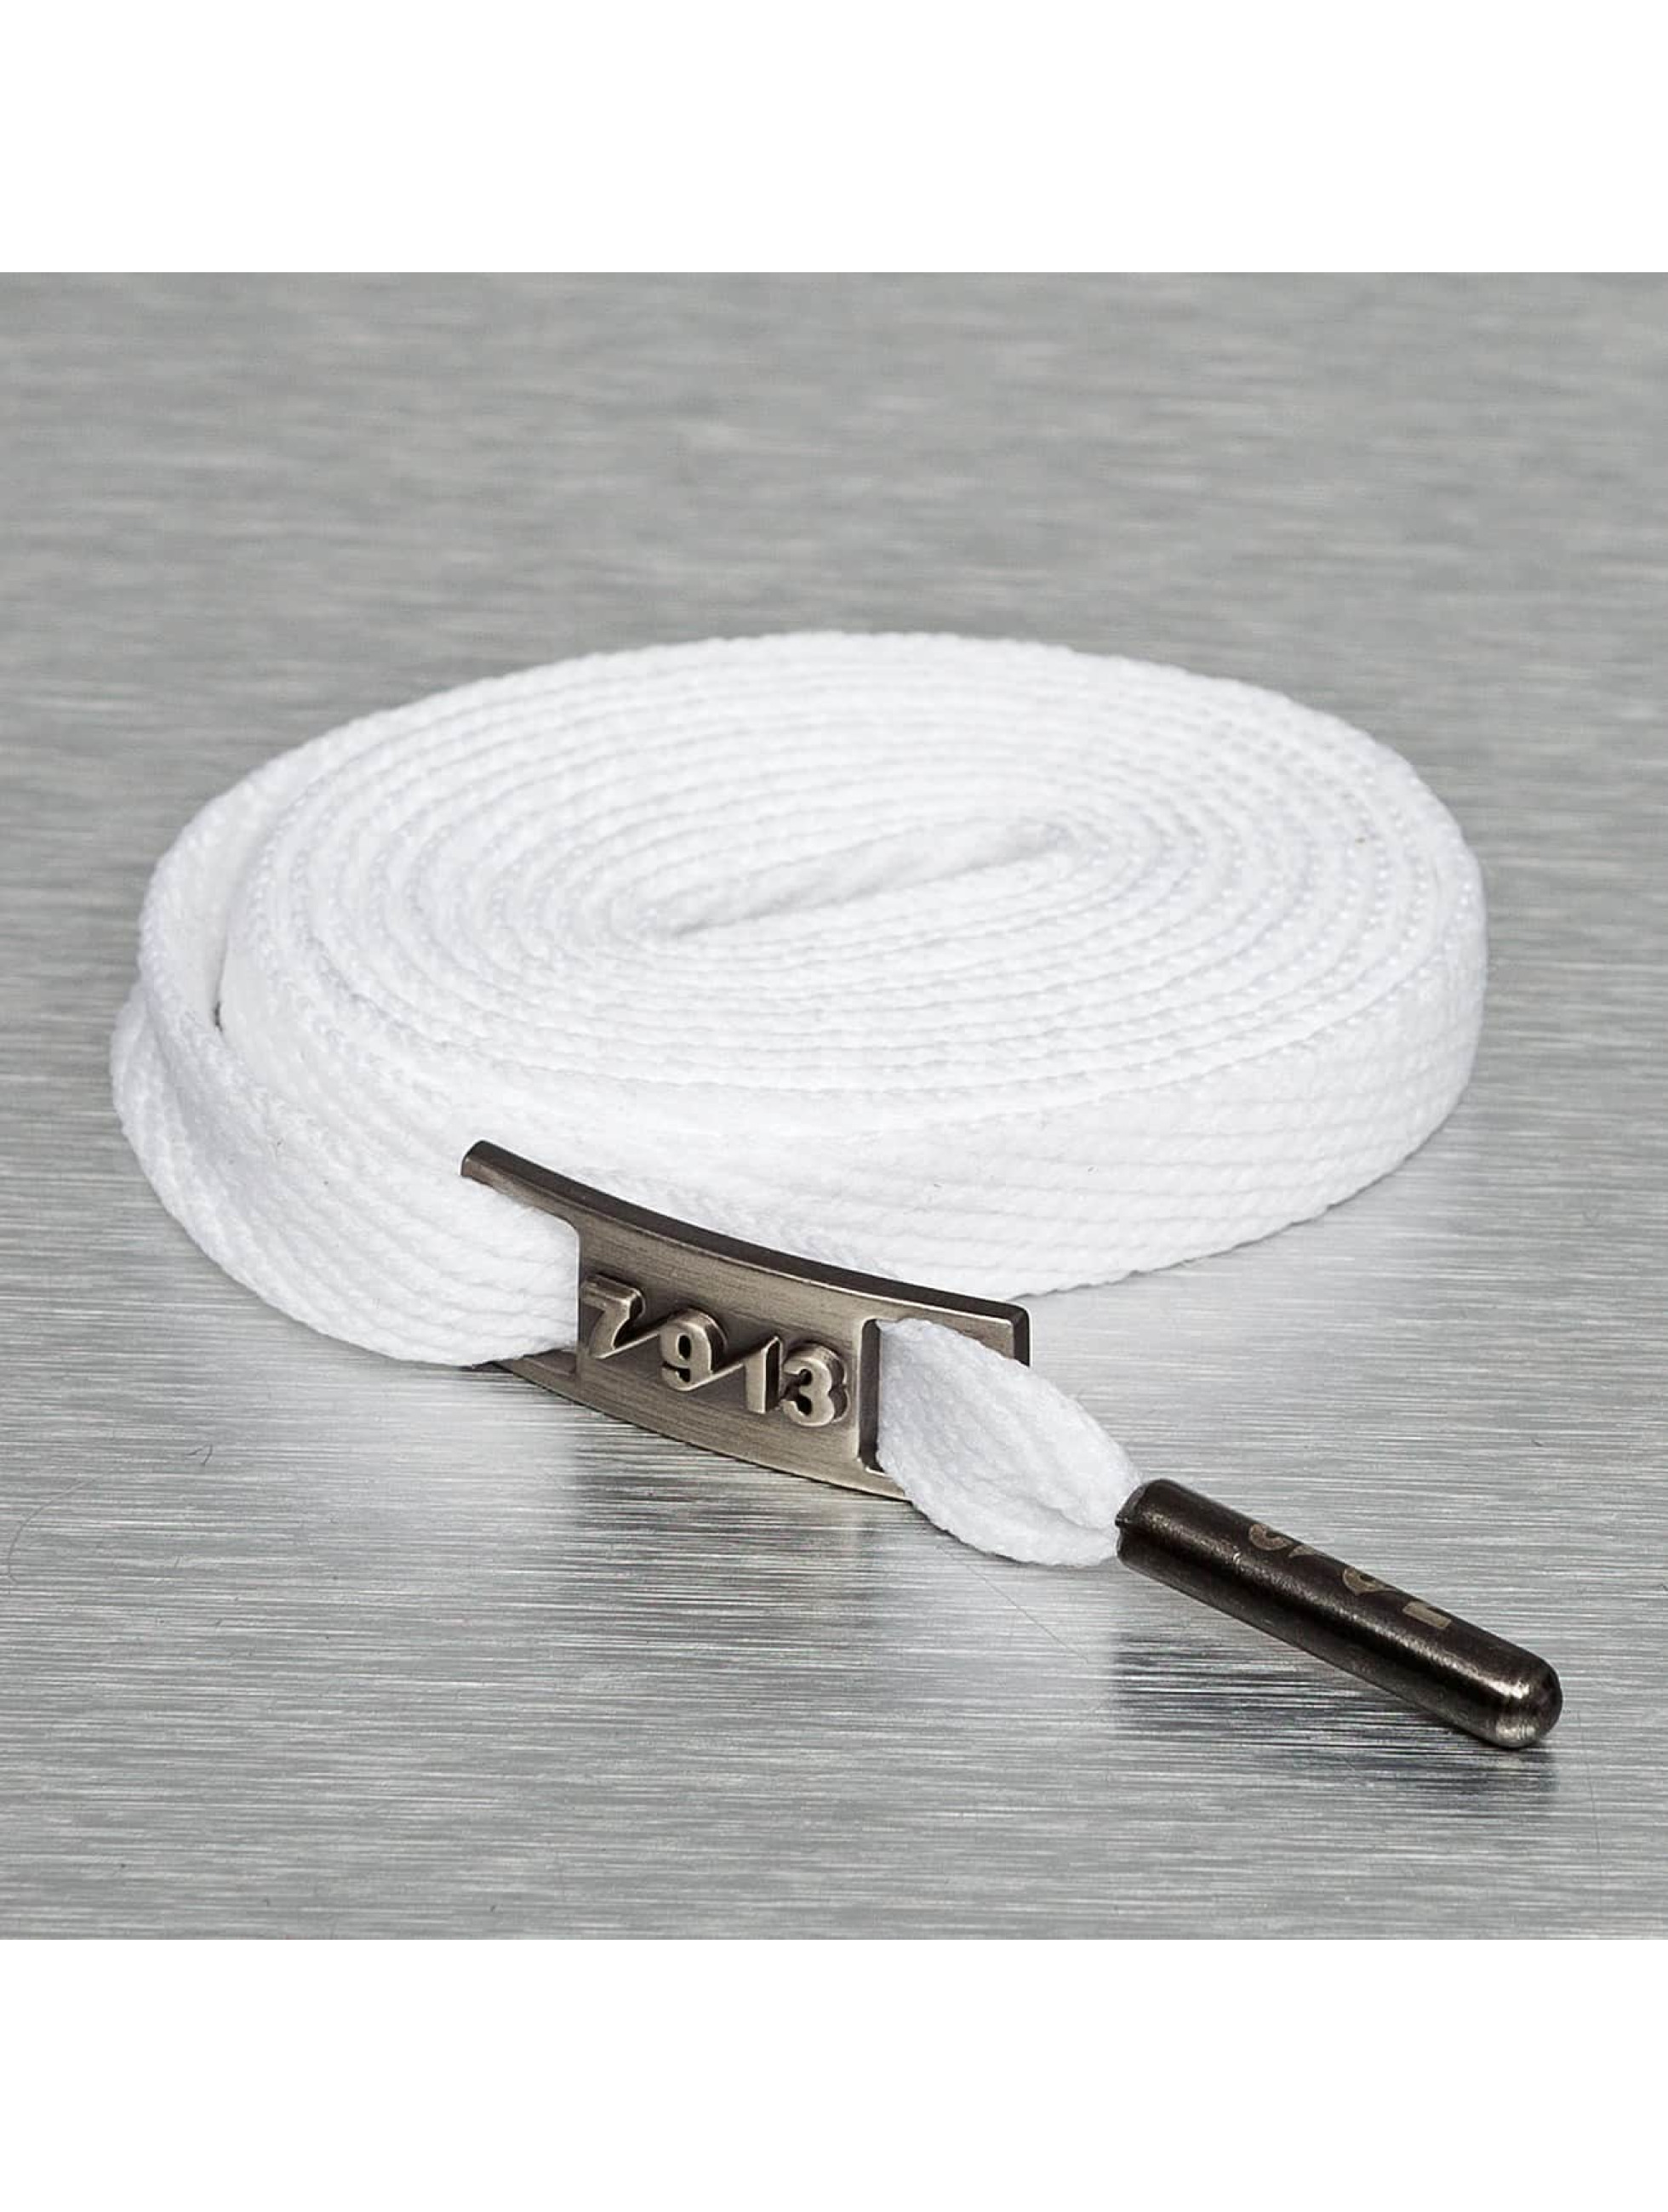 Seven Nine 13 Shoe accessorie Full Metal white